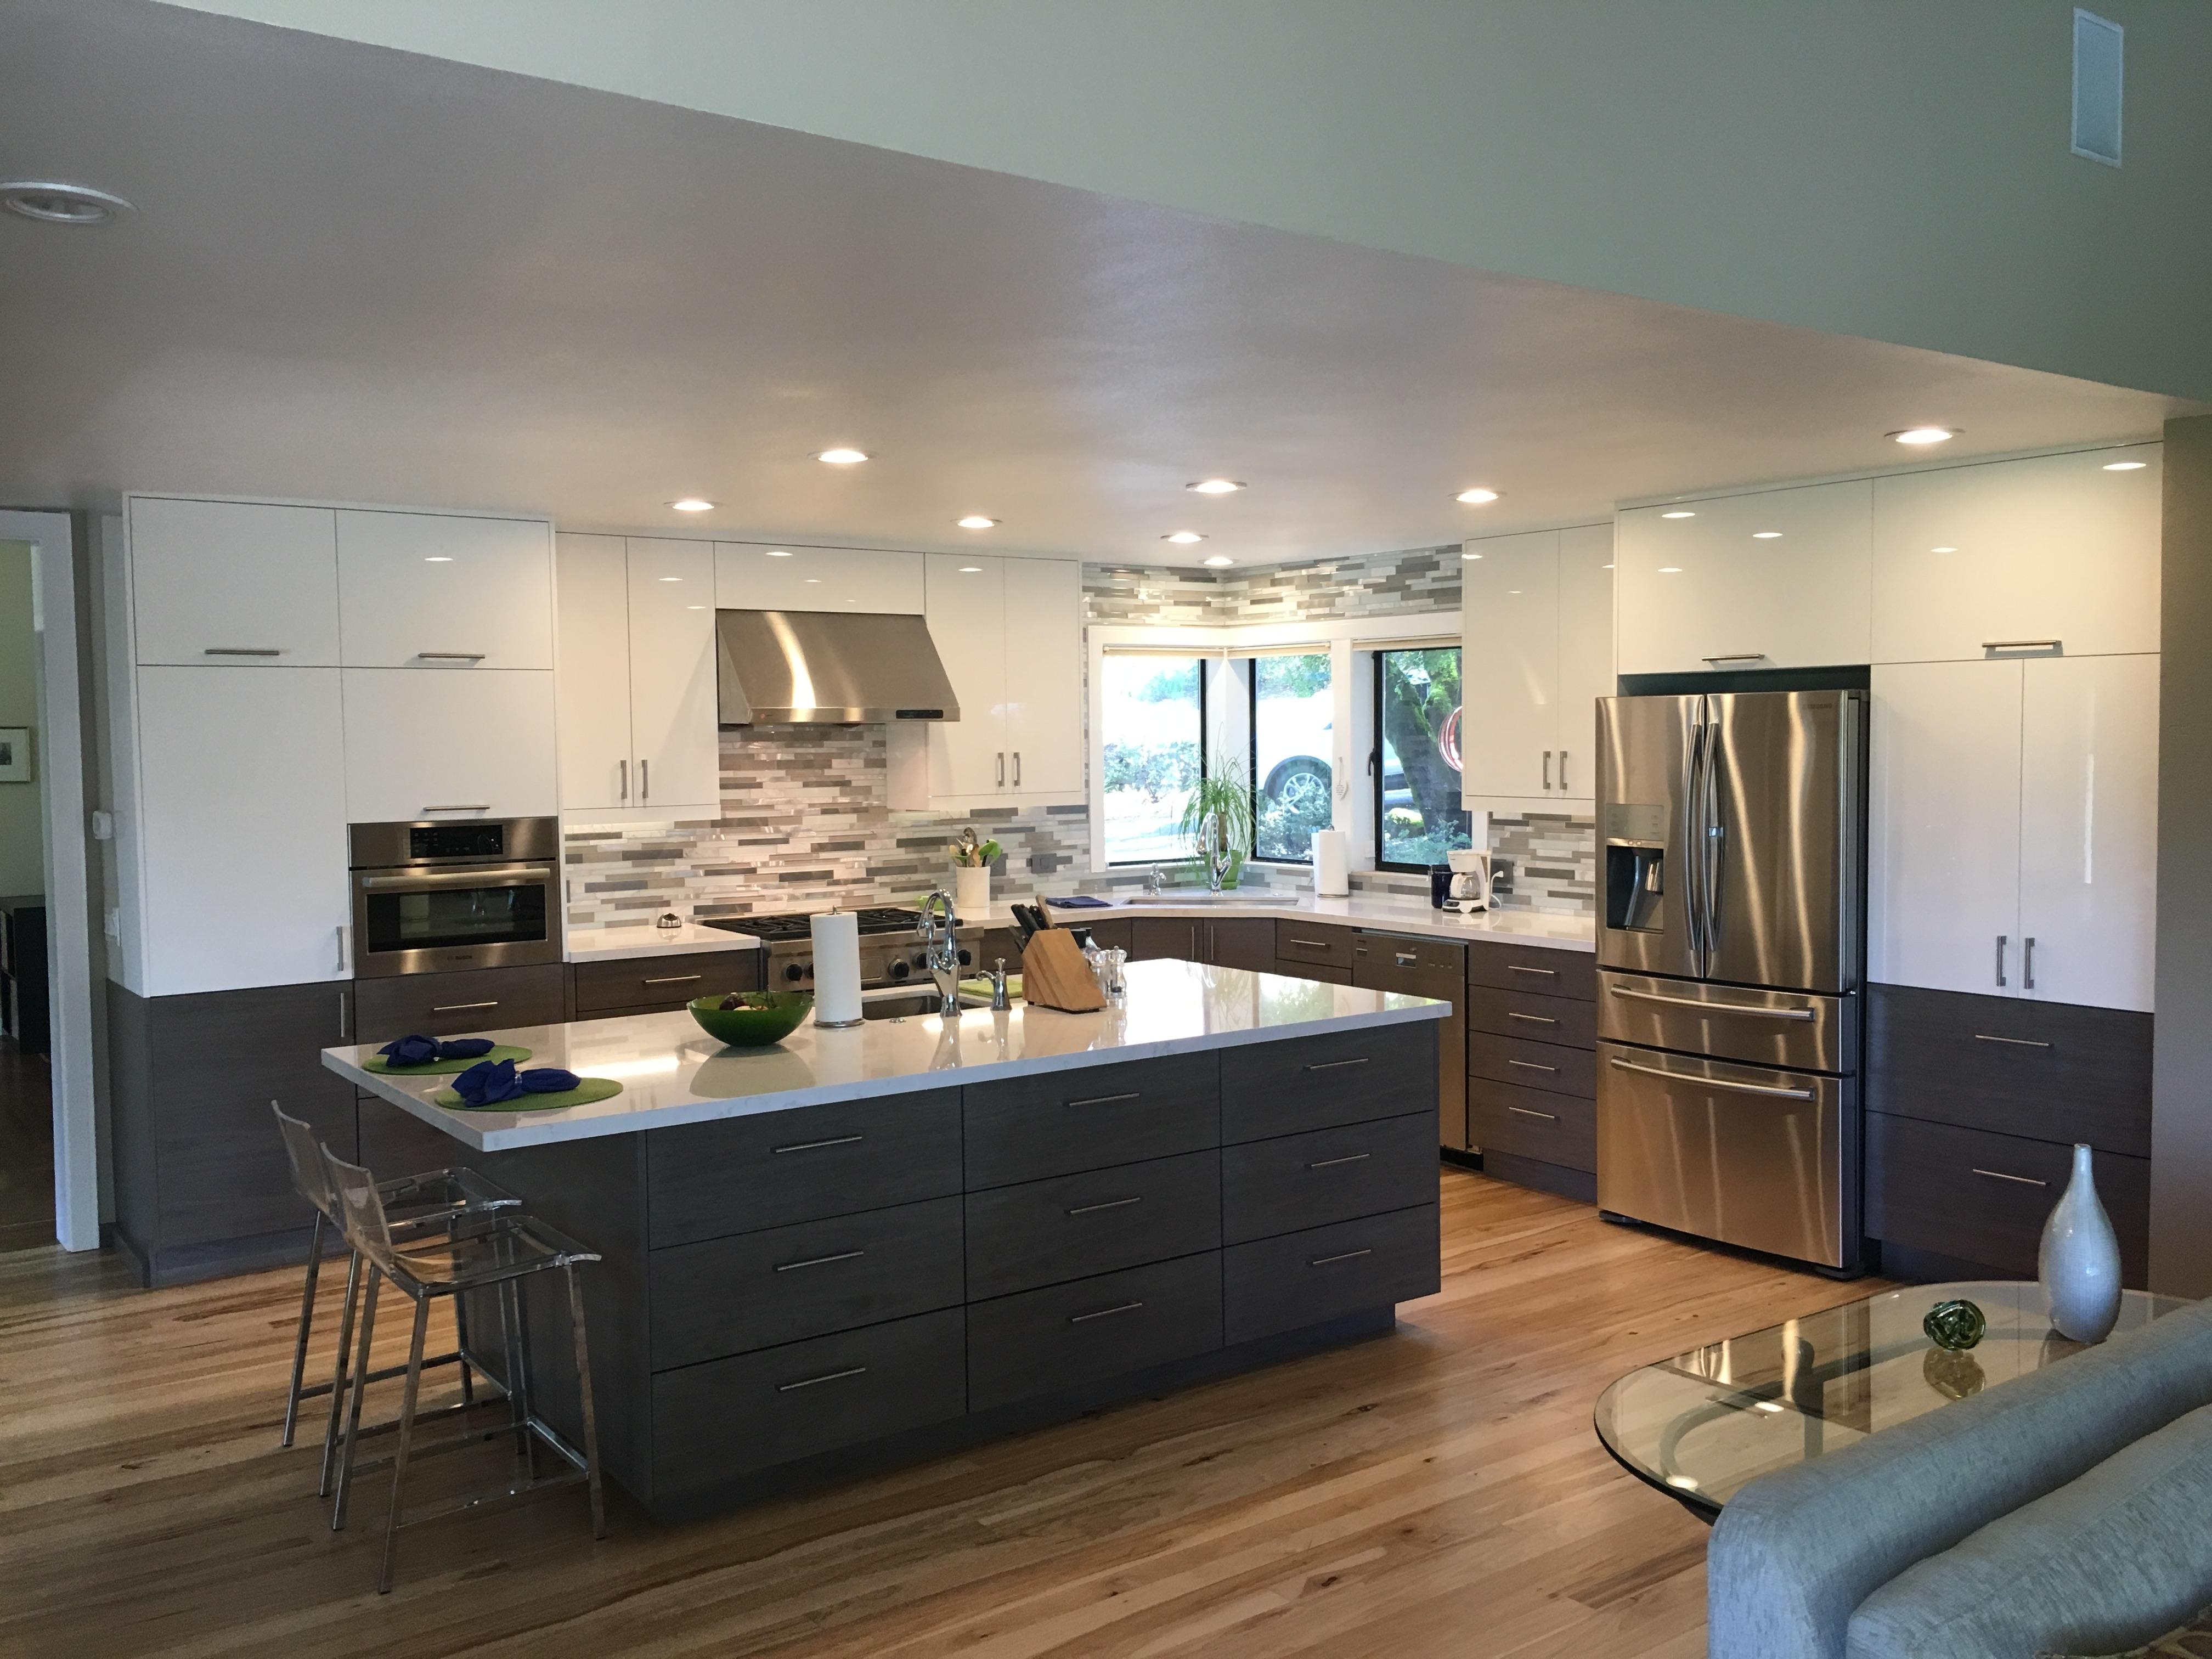 Teevax Home Appliance Kitchen Center Santa Rosa Ca